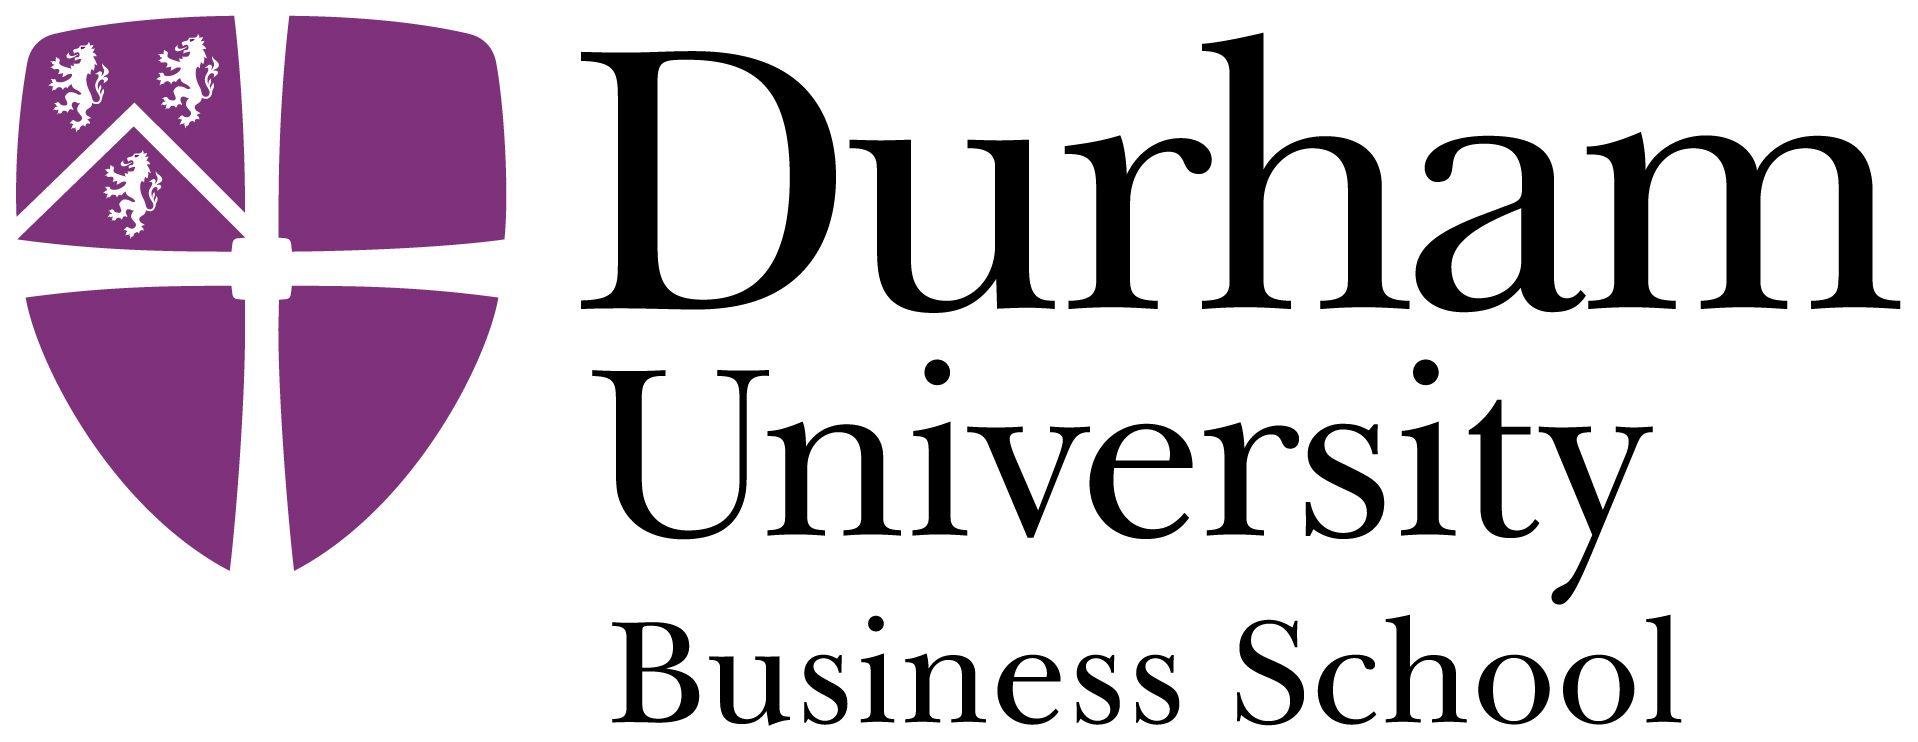 business school logo Google Search Durham university